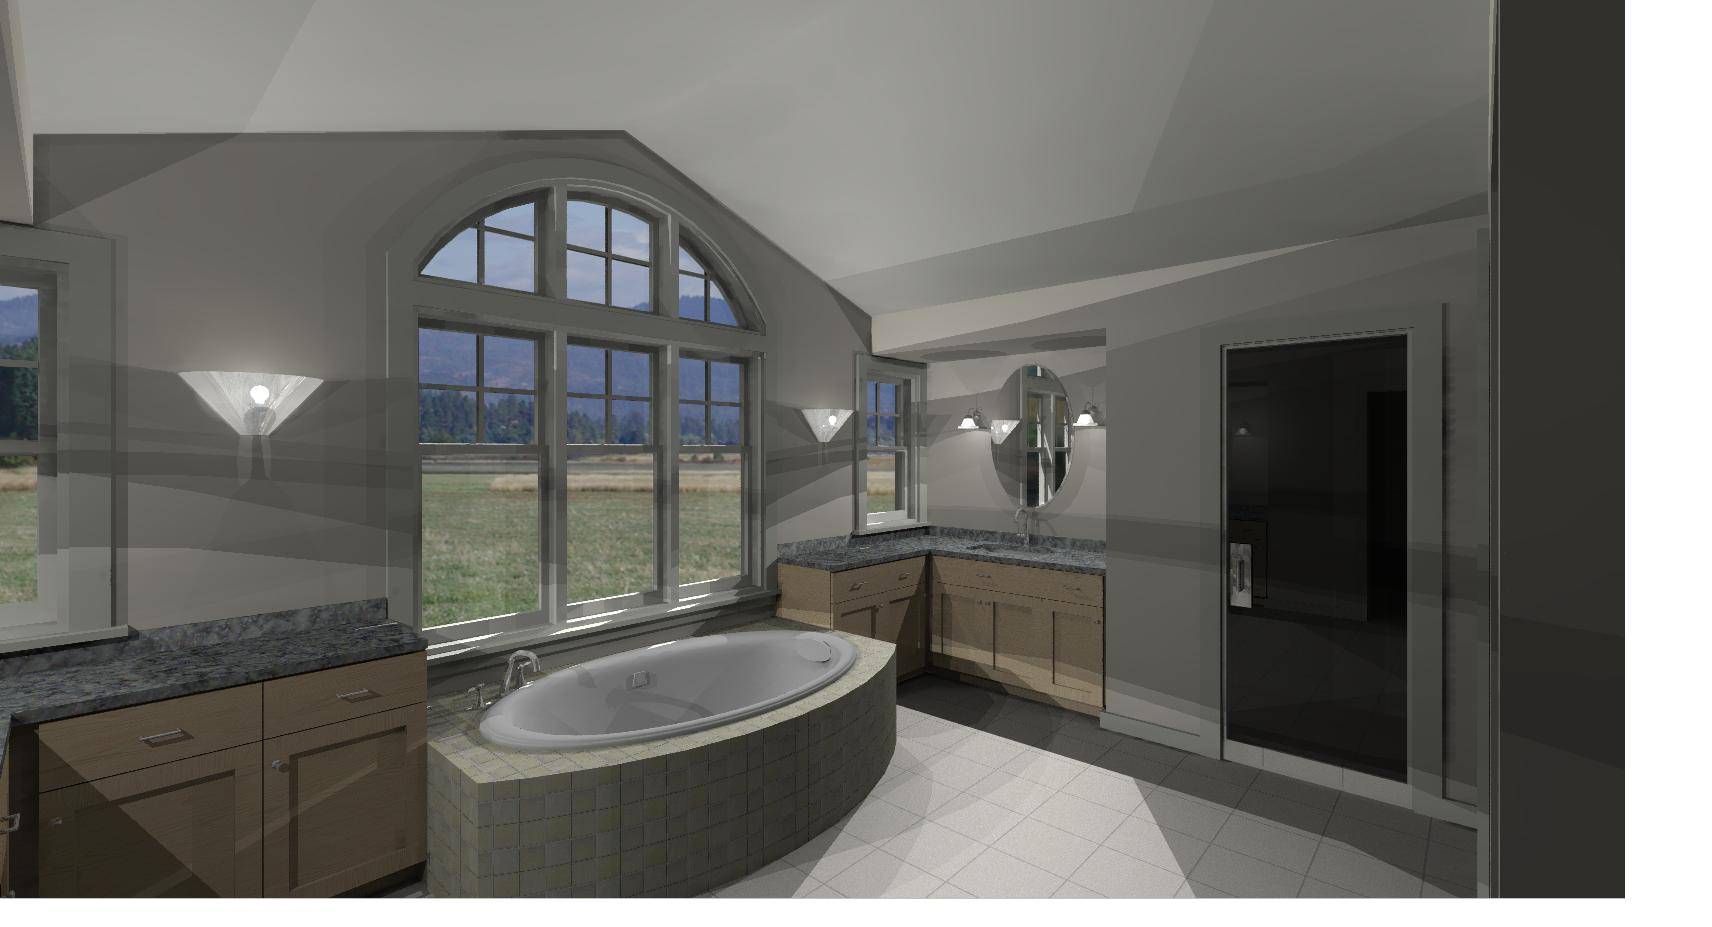 Hgtv Home Design Software Vs Chief Architect Best Healthy